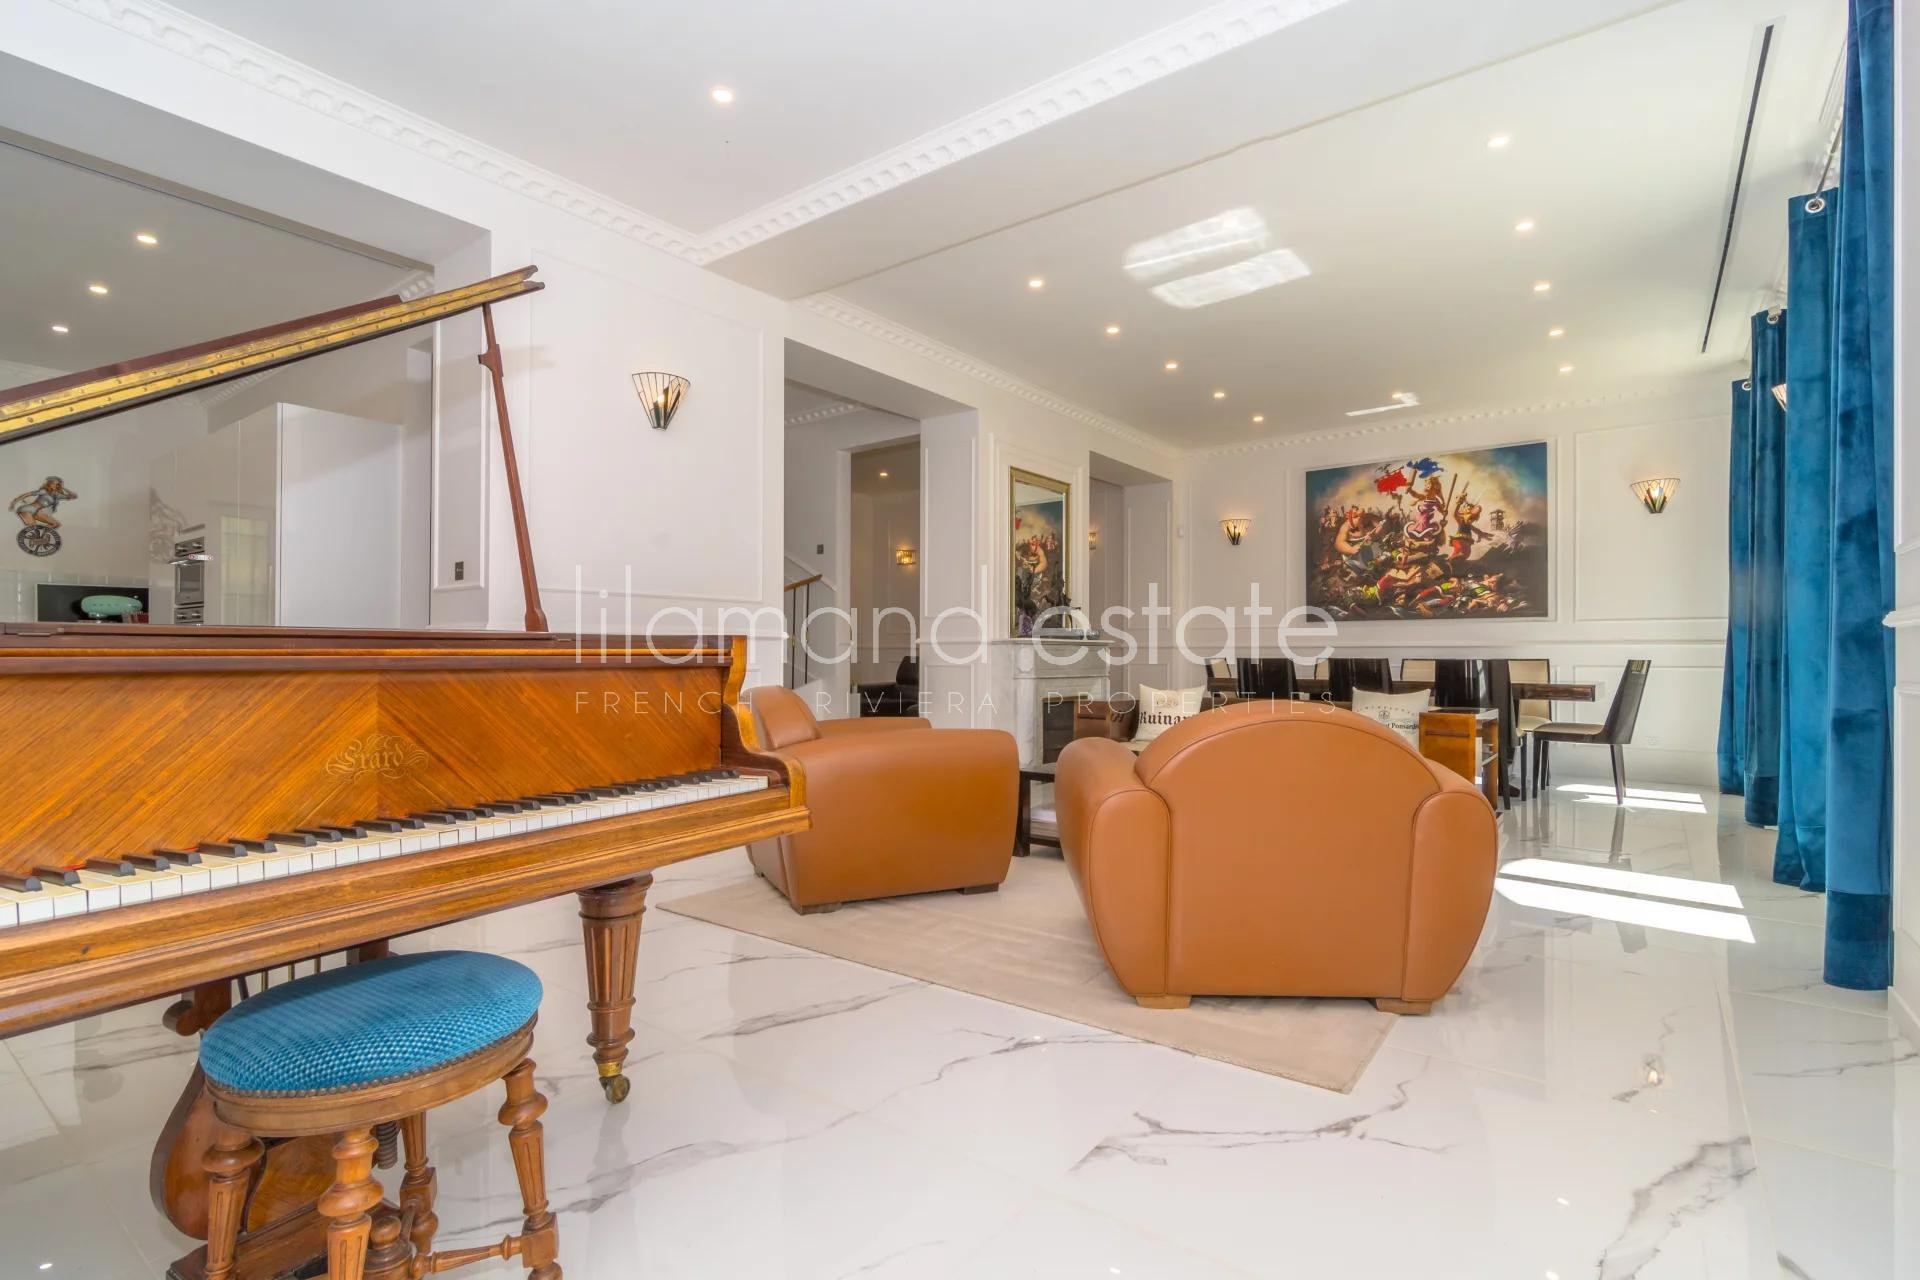 4294046-CANNES 150M RUE D'ANTIBES - HOTEL PARTICULIER BELLE EPOQUE